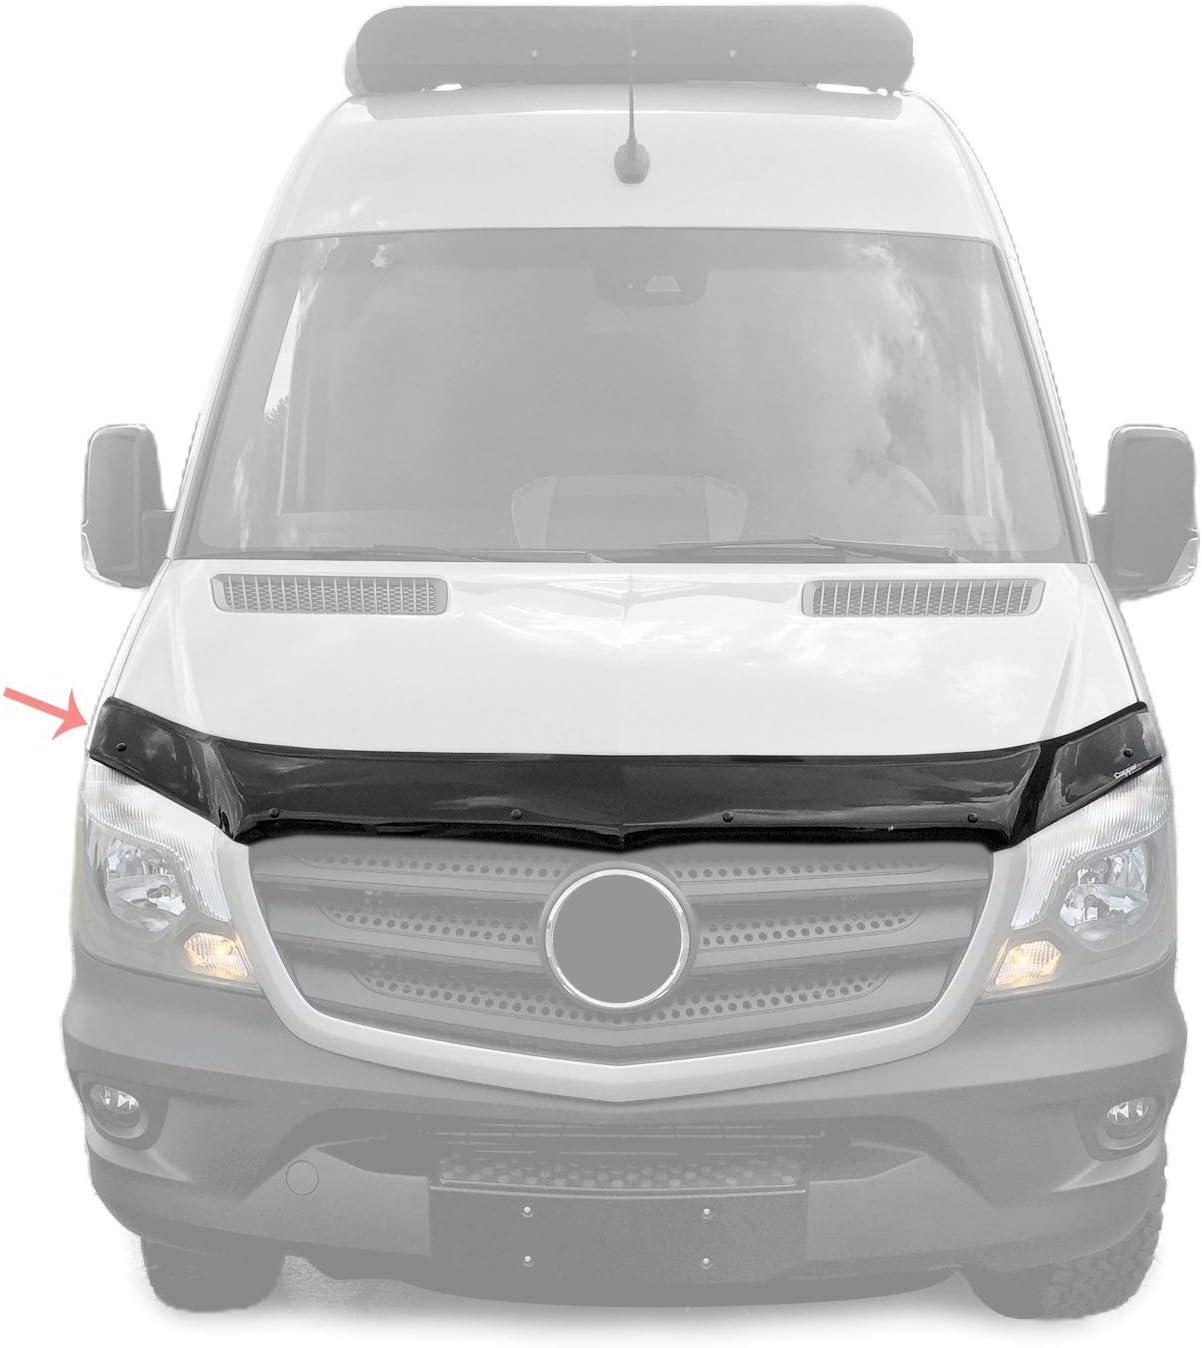 For Mercedes Sprinter W901 2000-2006 Front Bug Shield Hood Deflector Guard